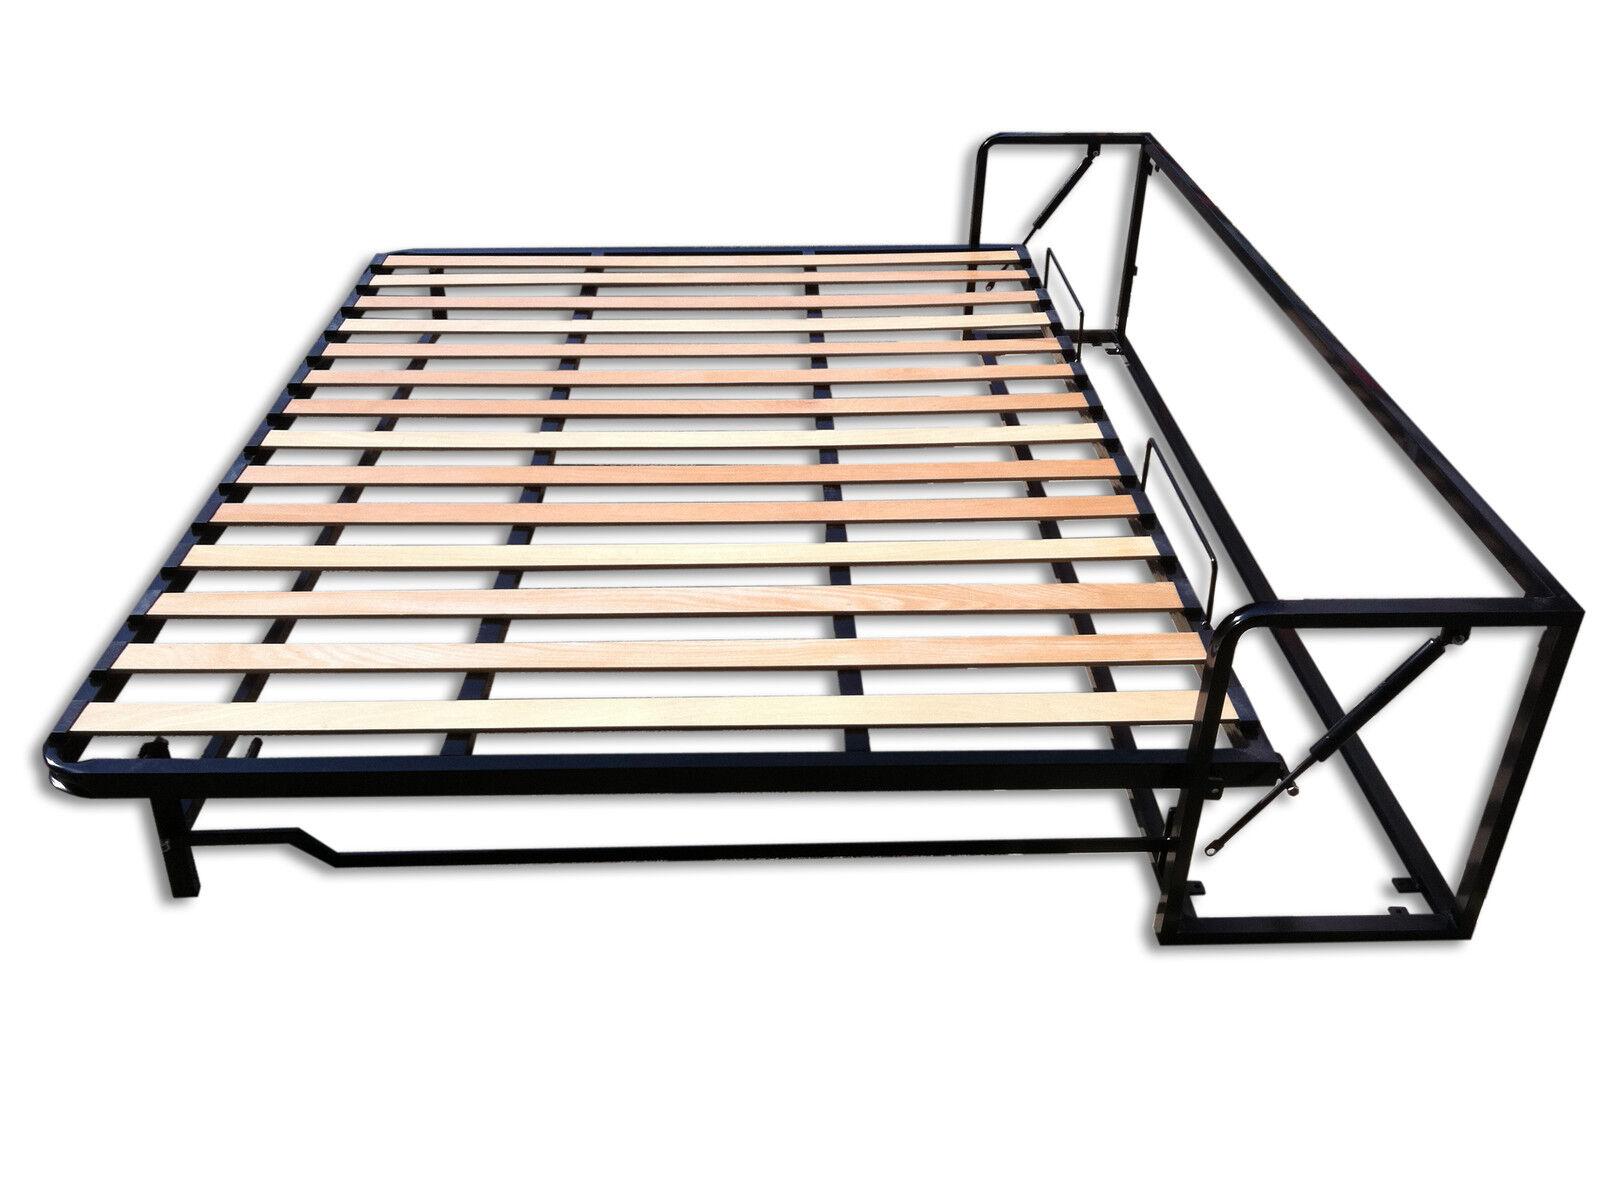 Somier cama abatible horizontal cama empotrable horizontal - Construir cama abatible ...